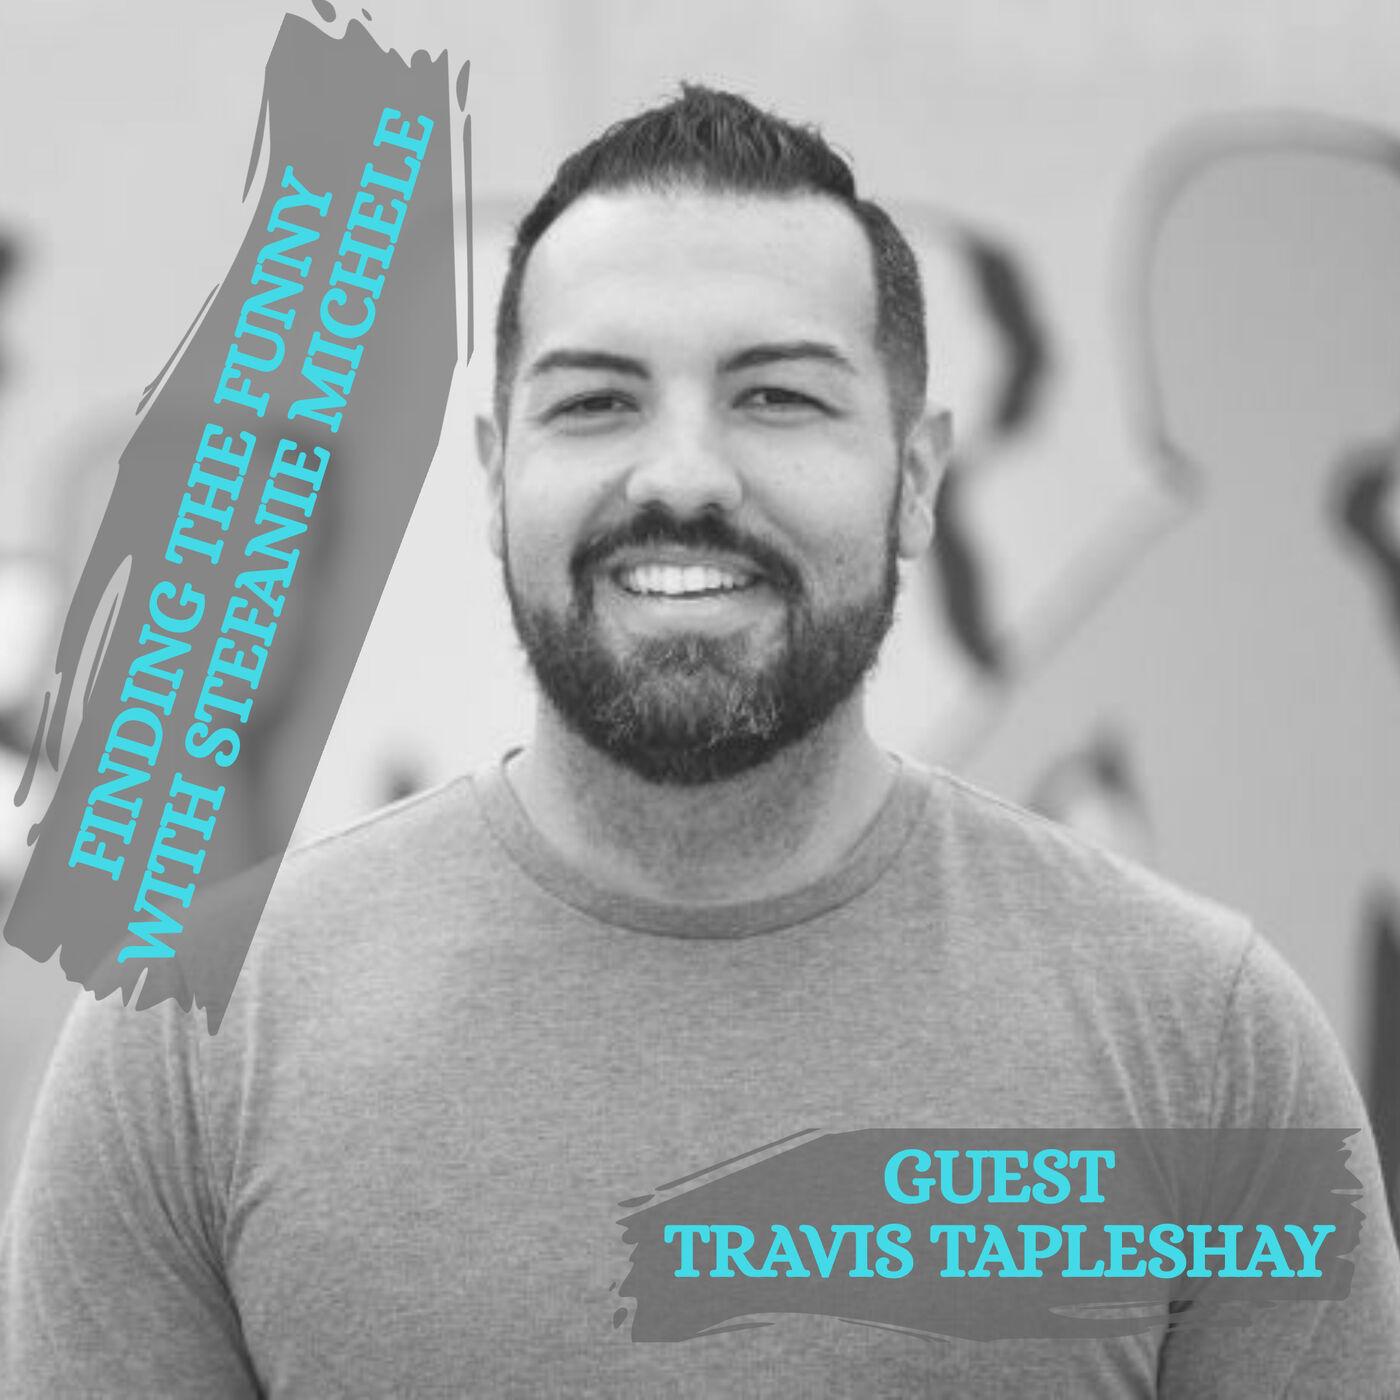 Travis Tapleshay